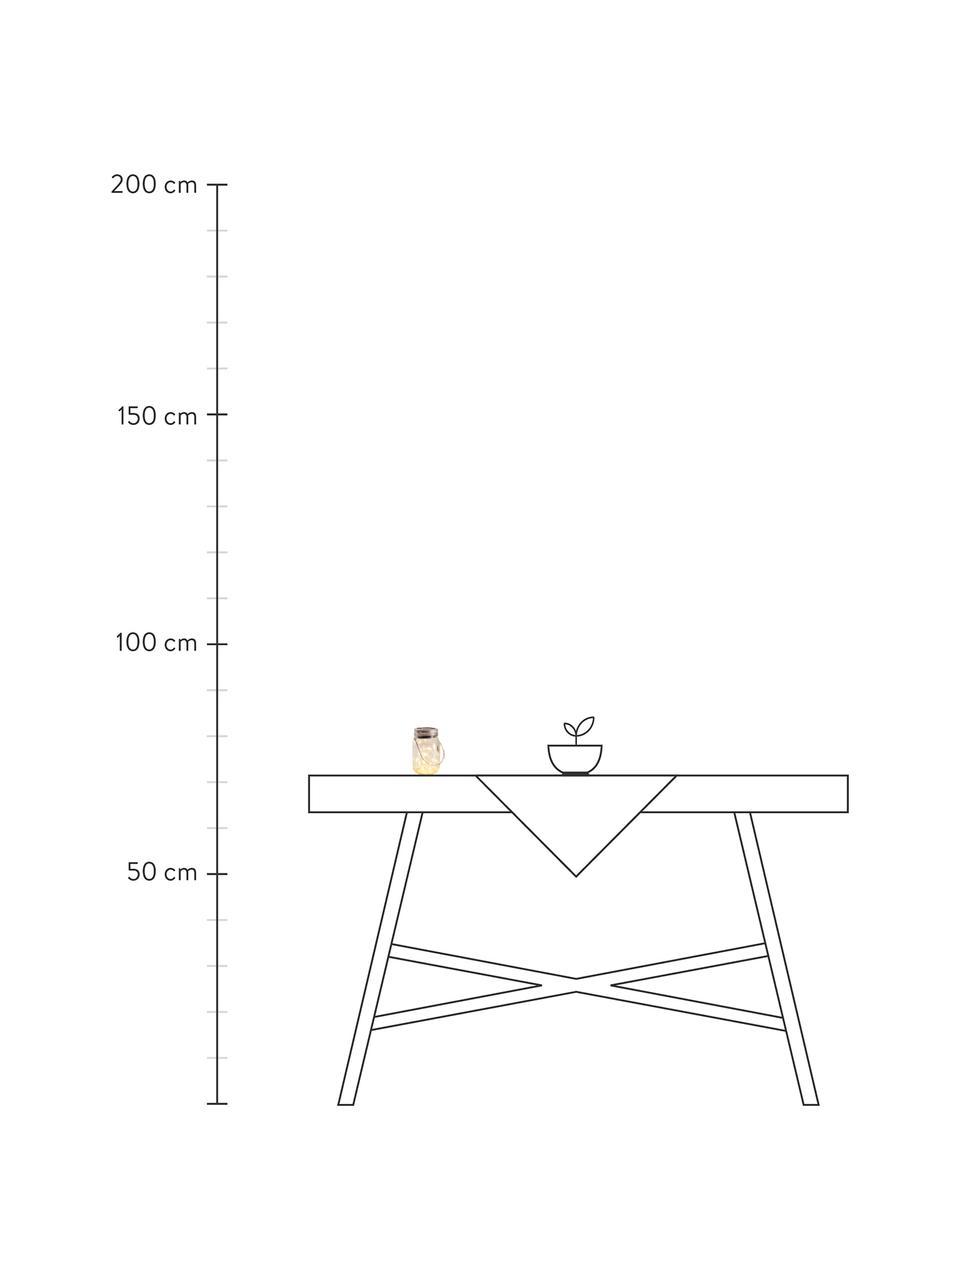 Solar outdoor tafellampen Nanay, 3 stuks, Lampenkap: glas, Deksel: kunststof, Transparant, zilverkleurig, Ø 8 x H 13 cm